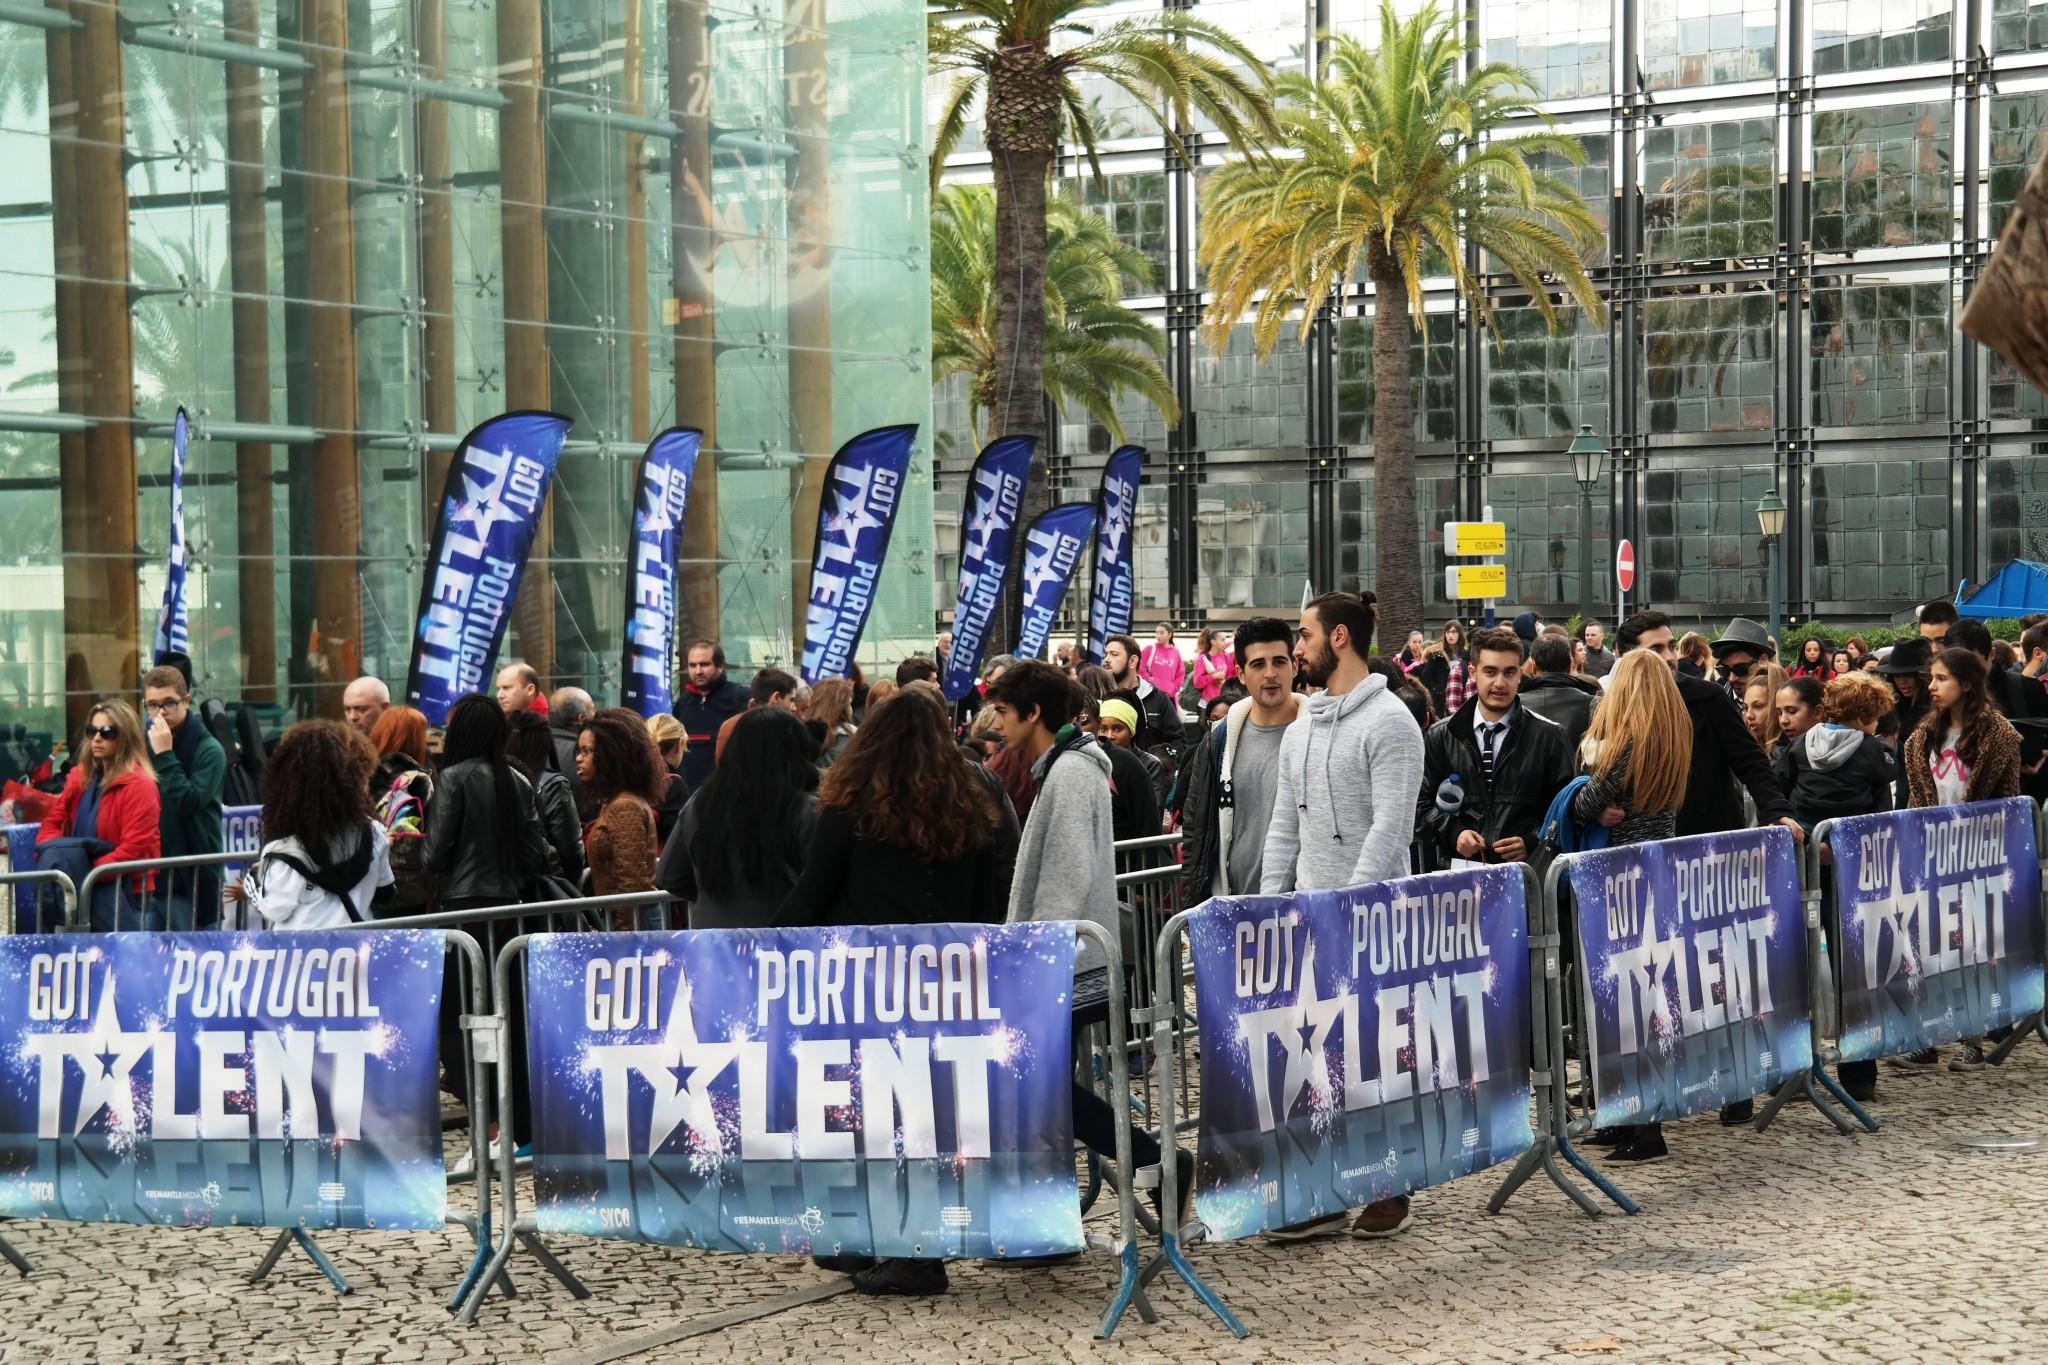 Got Talent Portugal 02 Estoril 014 «Got Talent Portugal»: Estoril Acolhe Mais De 3 Mil Candidatos [Com Fotos]